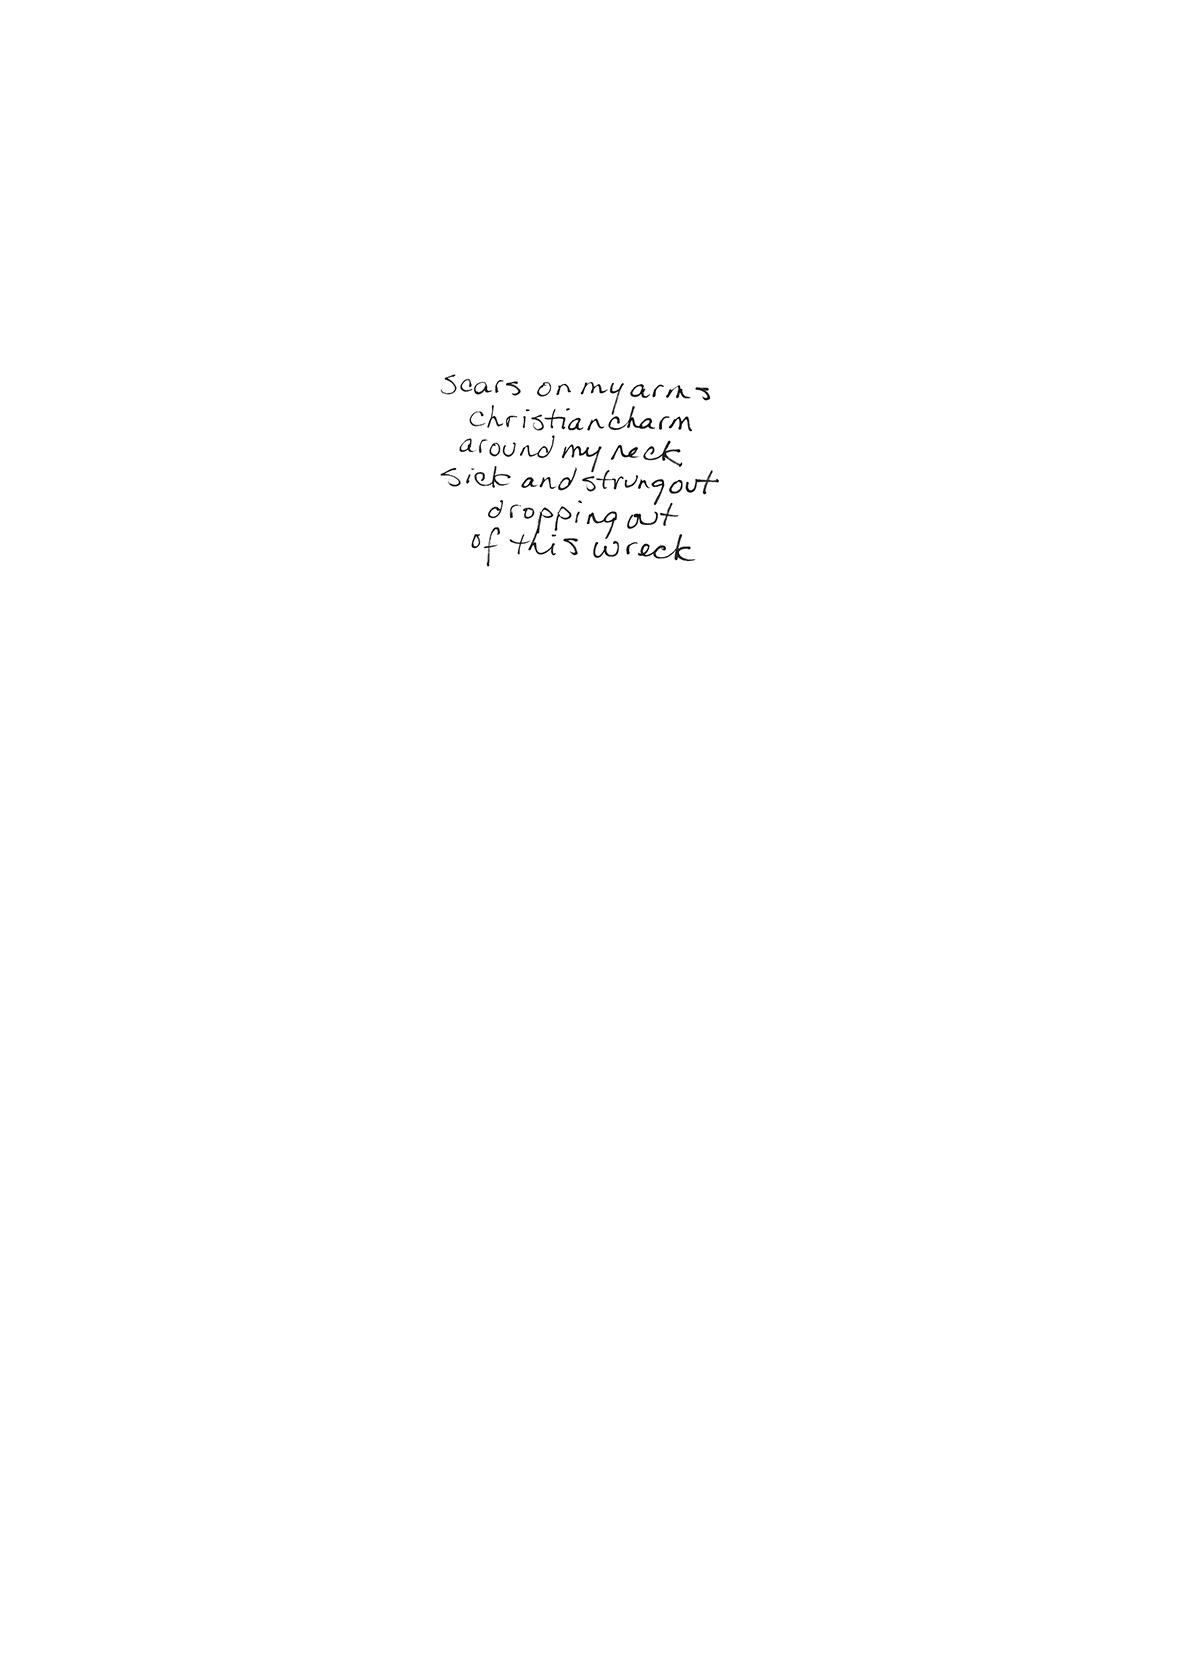 Michael_poem.jpg